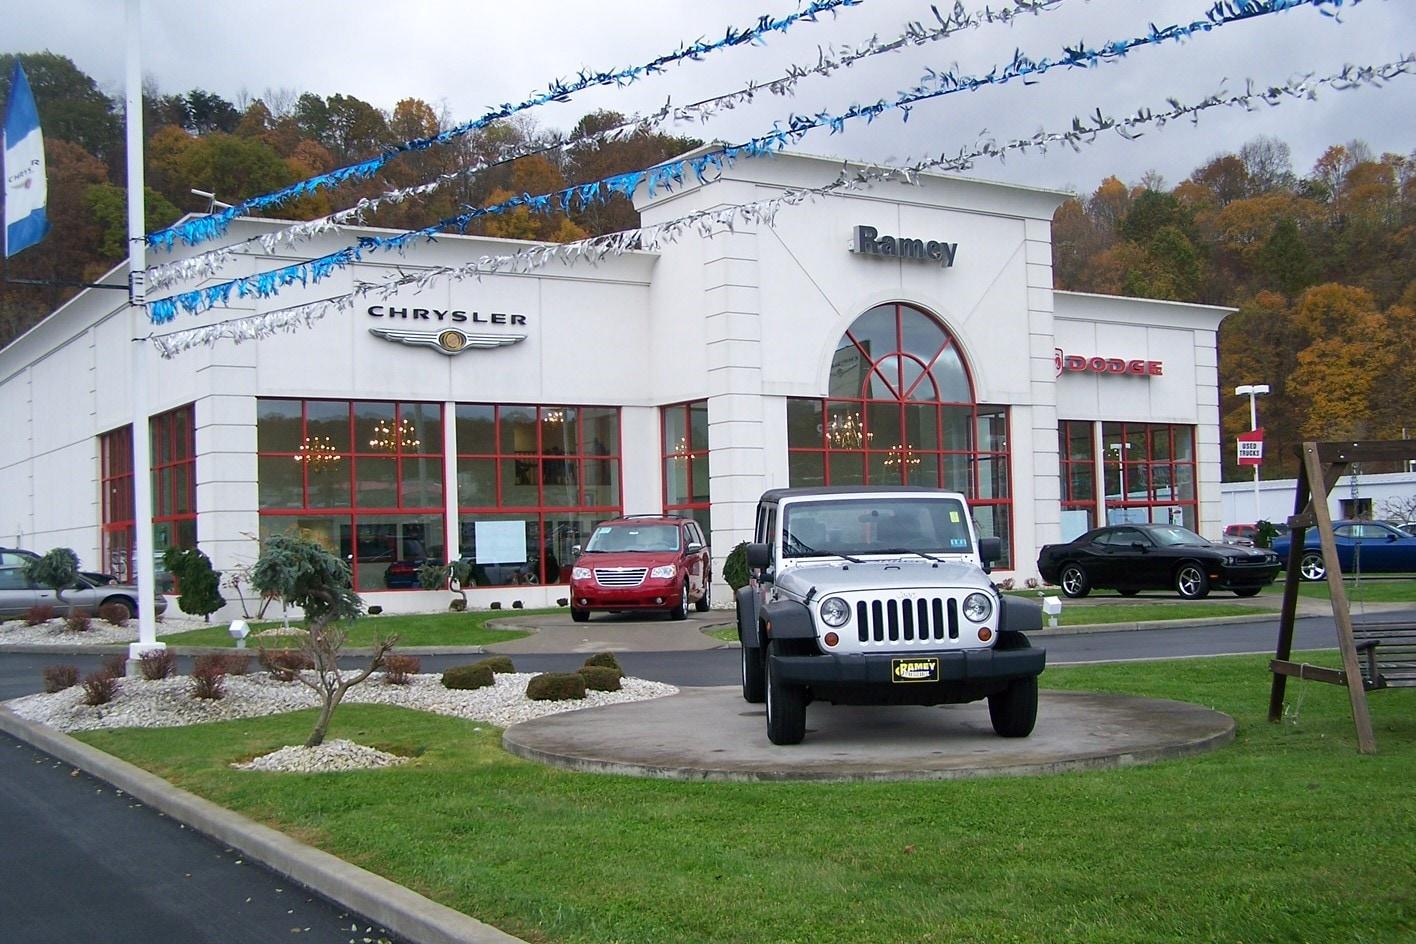 Dodge Dealer Princeton Wv >> Ramey Motors Princeton Wv - impremedia.net